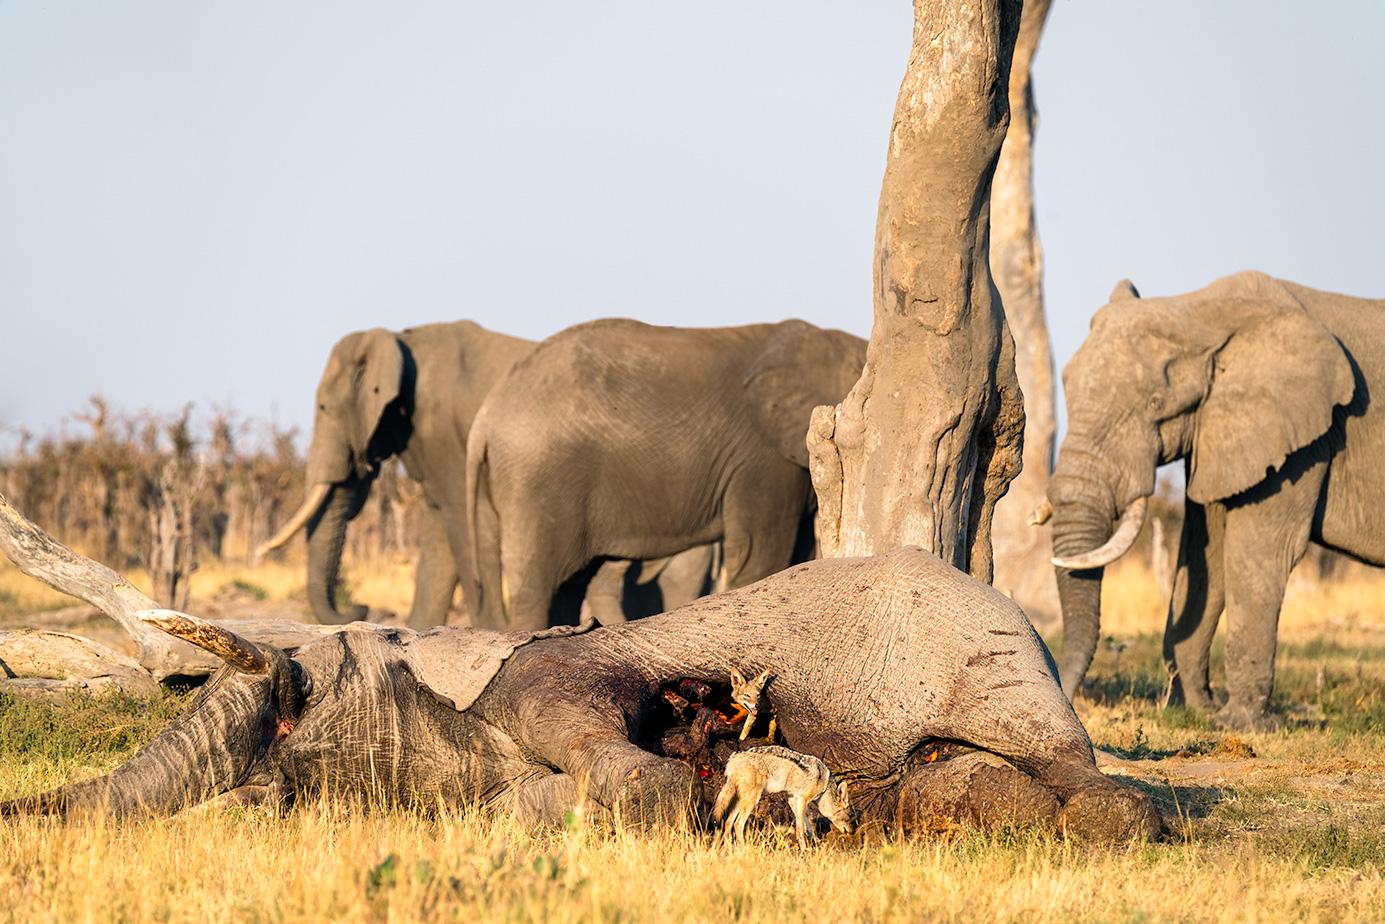 Elefantenkill - Von Löwen getötet im Okavango Delta - Chobe Nationalpark - Botswana - Fotoreise / Fotosafari mit Benny Rebel